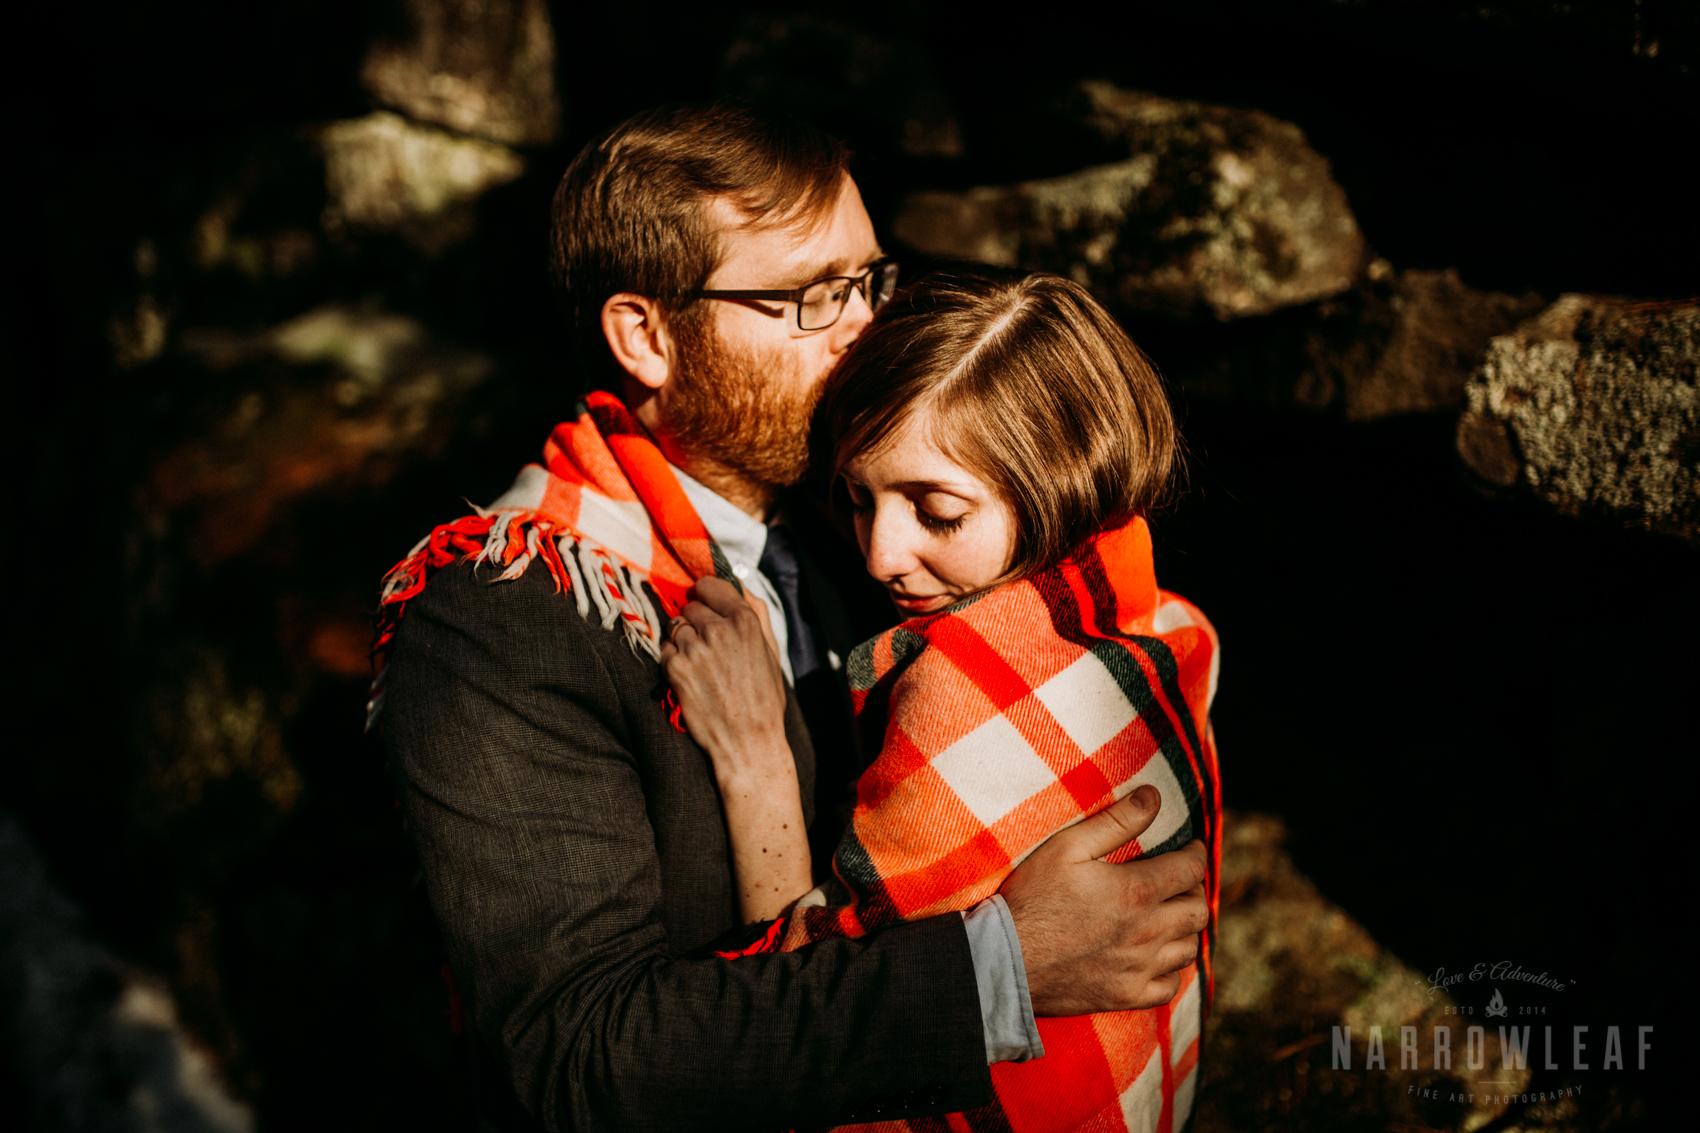 Spring-moody-wisconsin-woodsy-elopement-NarrowLeaf_Love_&_Adventure_Photography-9737.jpg